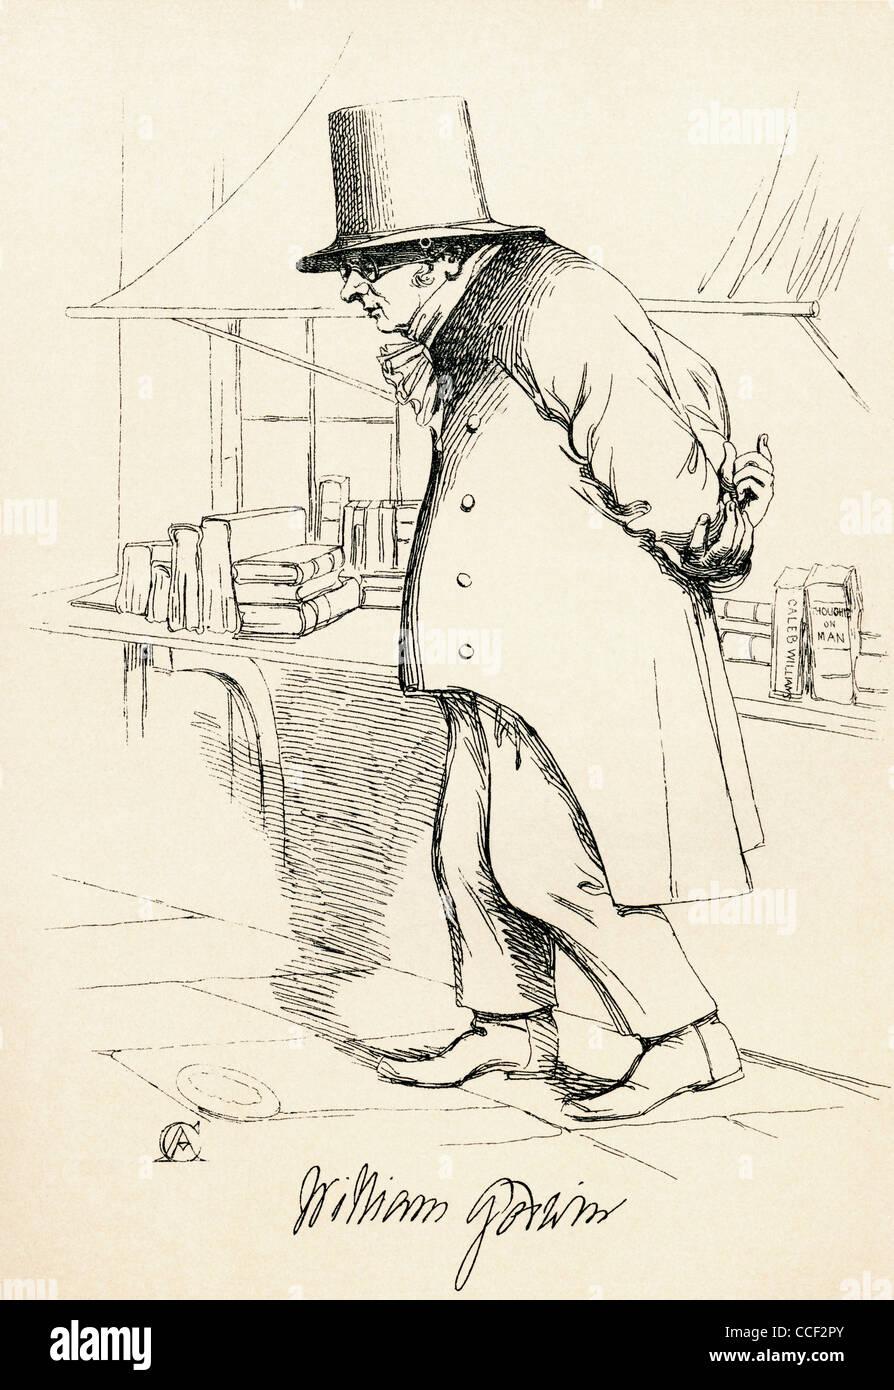 William Godwin, 1756 – 1836. English journalist, political philosopher and novelist. - Stock Image